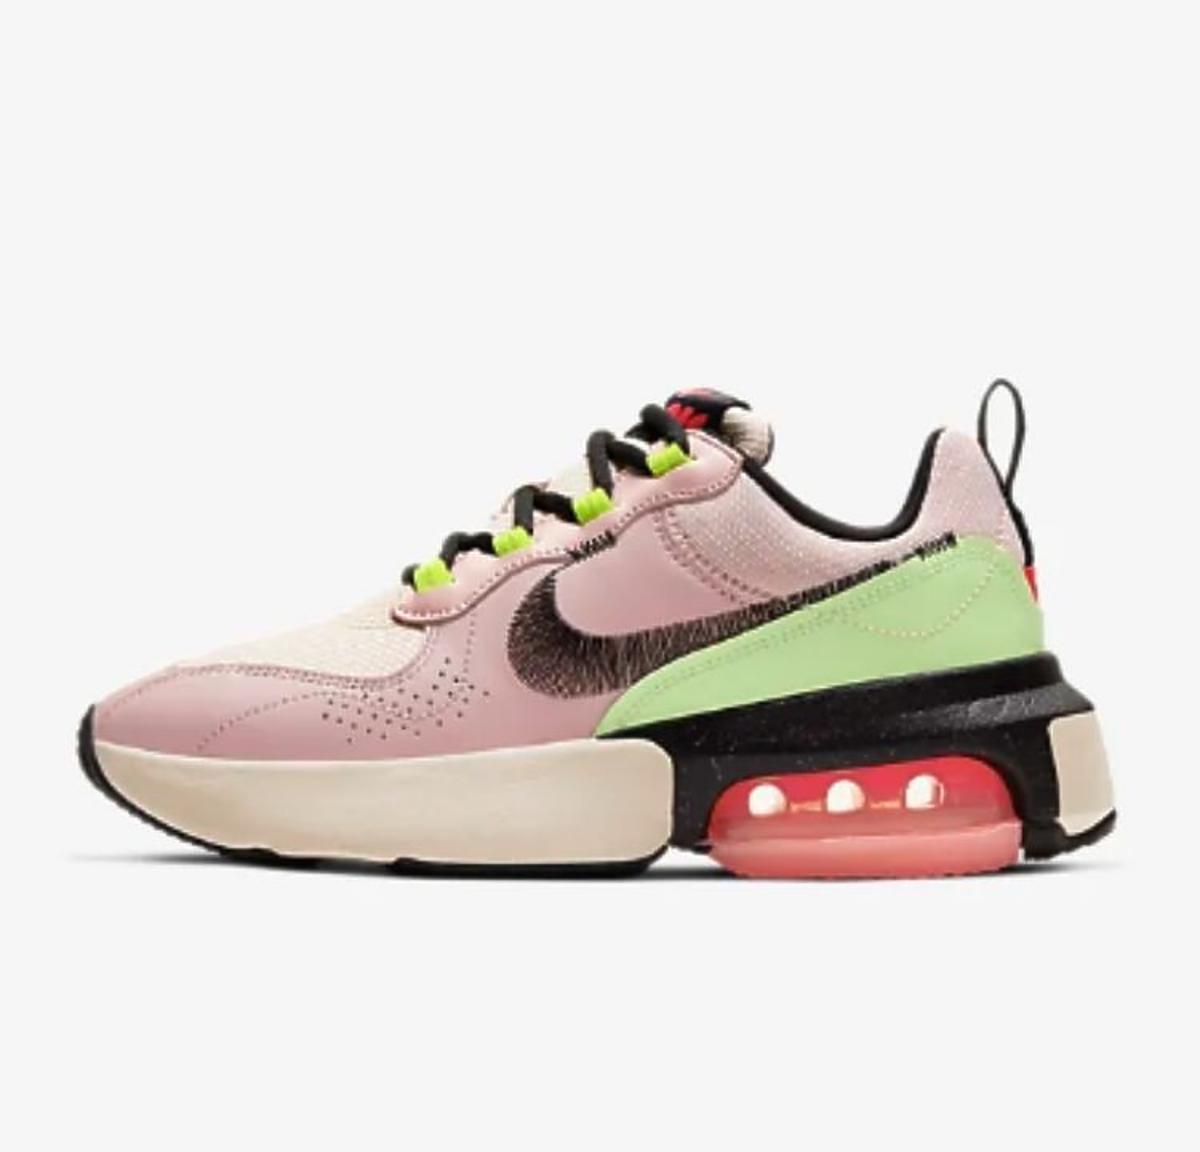 kolorowes sneakrsy Nike